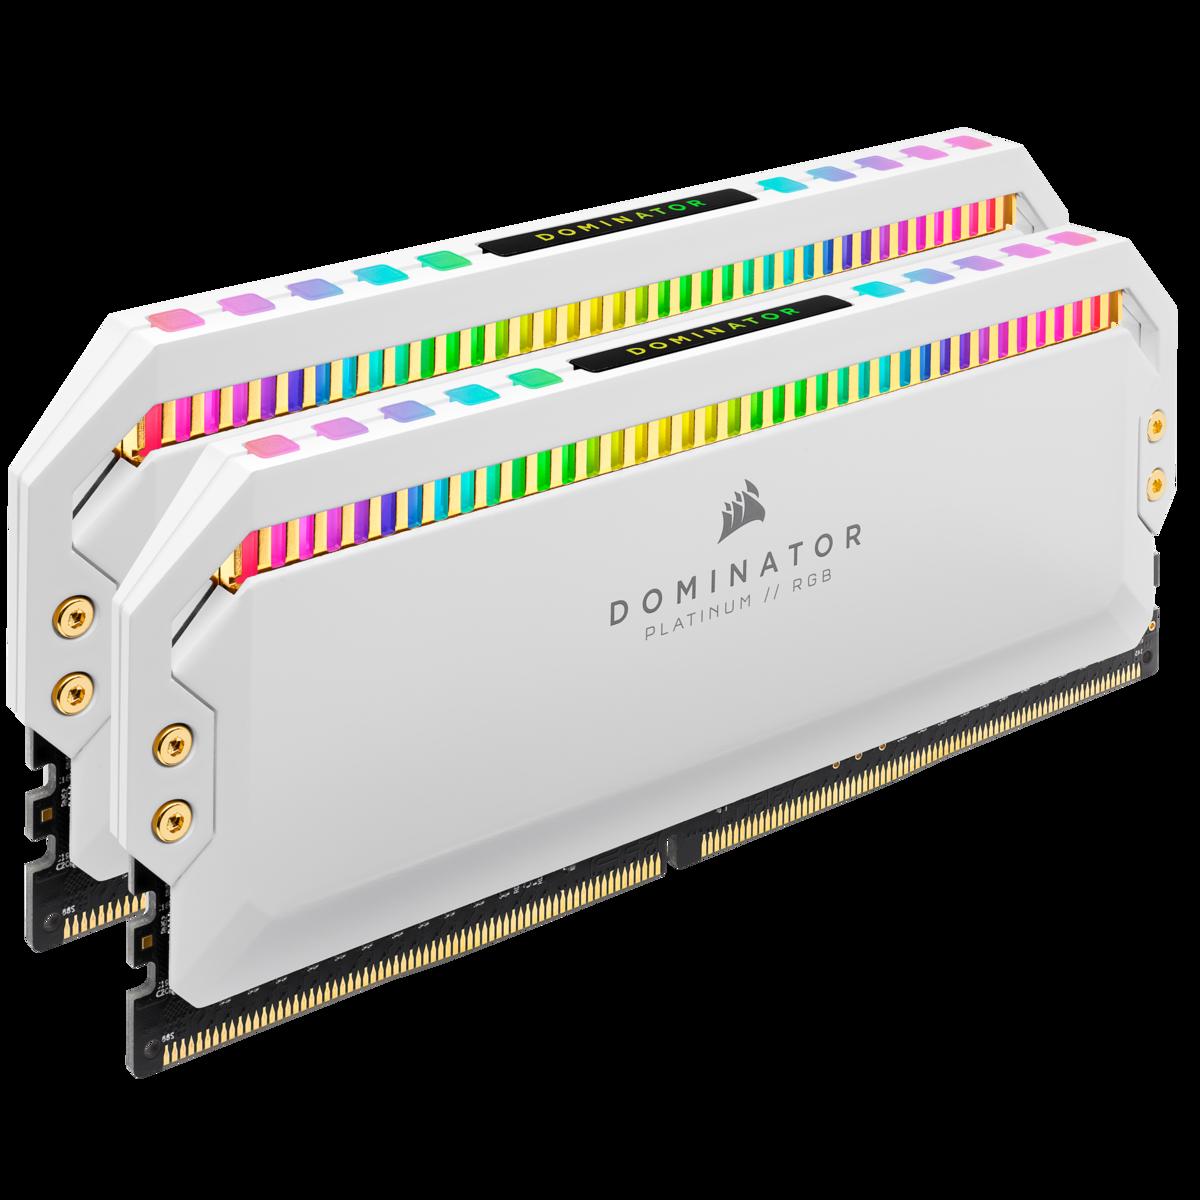 Memória DDR4 Corsair Dominator Platinum RGB, White, 16GB (2x8GB), 3200MHz, CMT16GX4M2C3200C16W